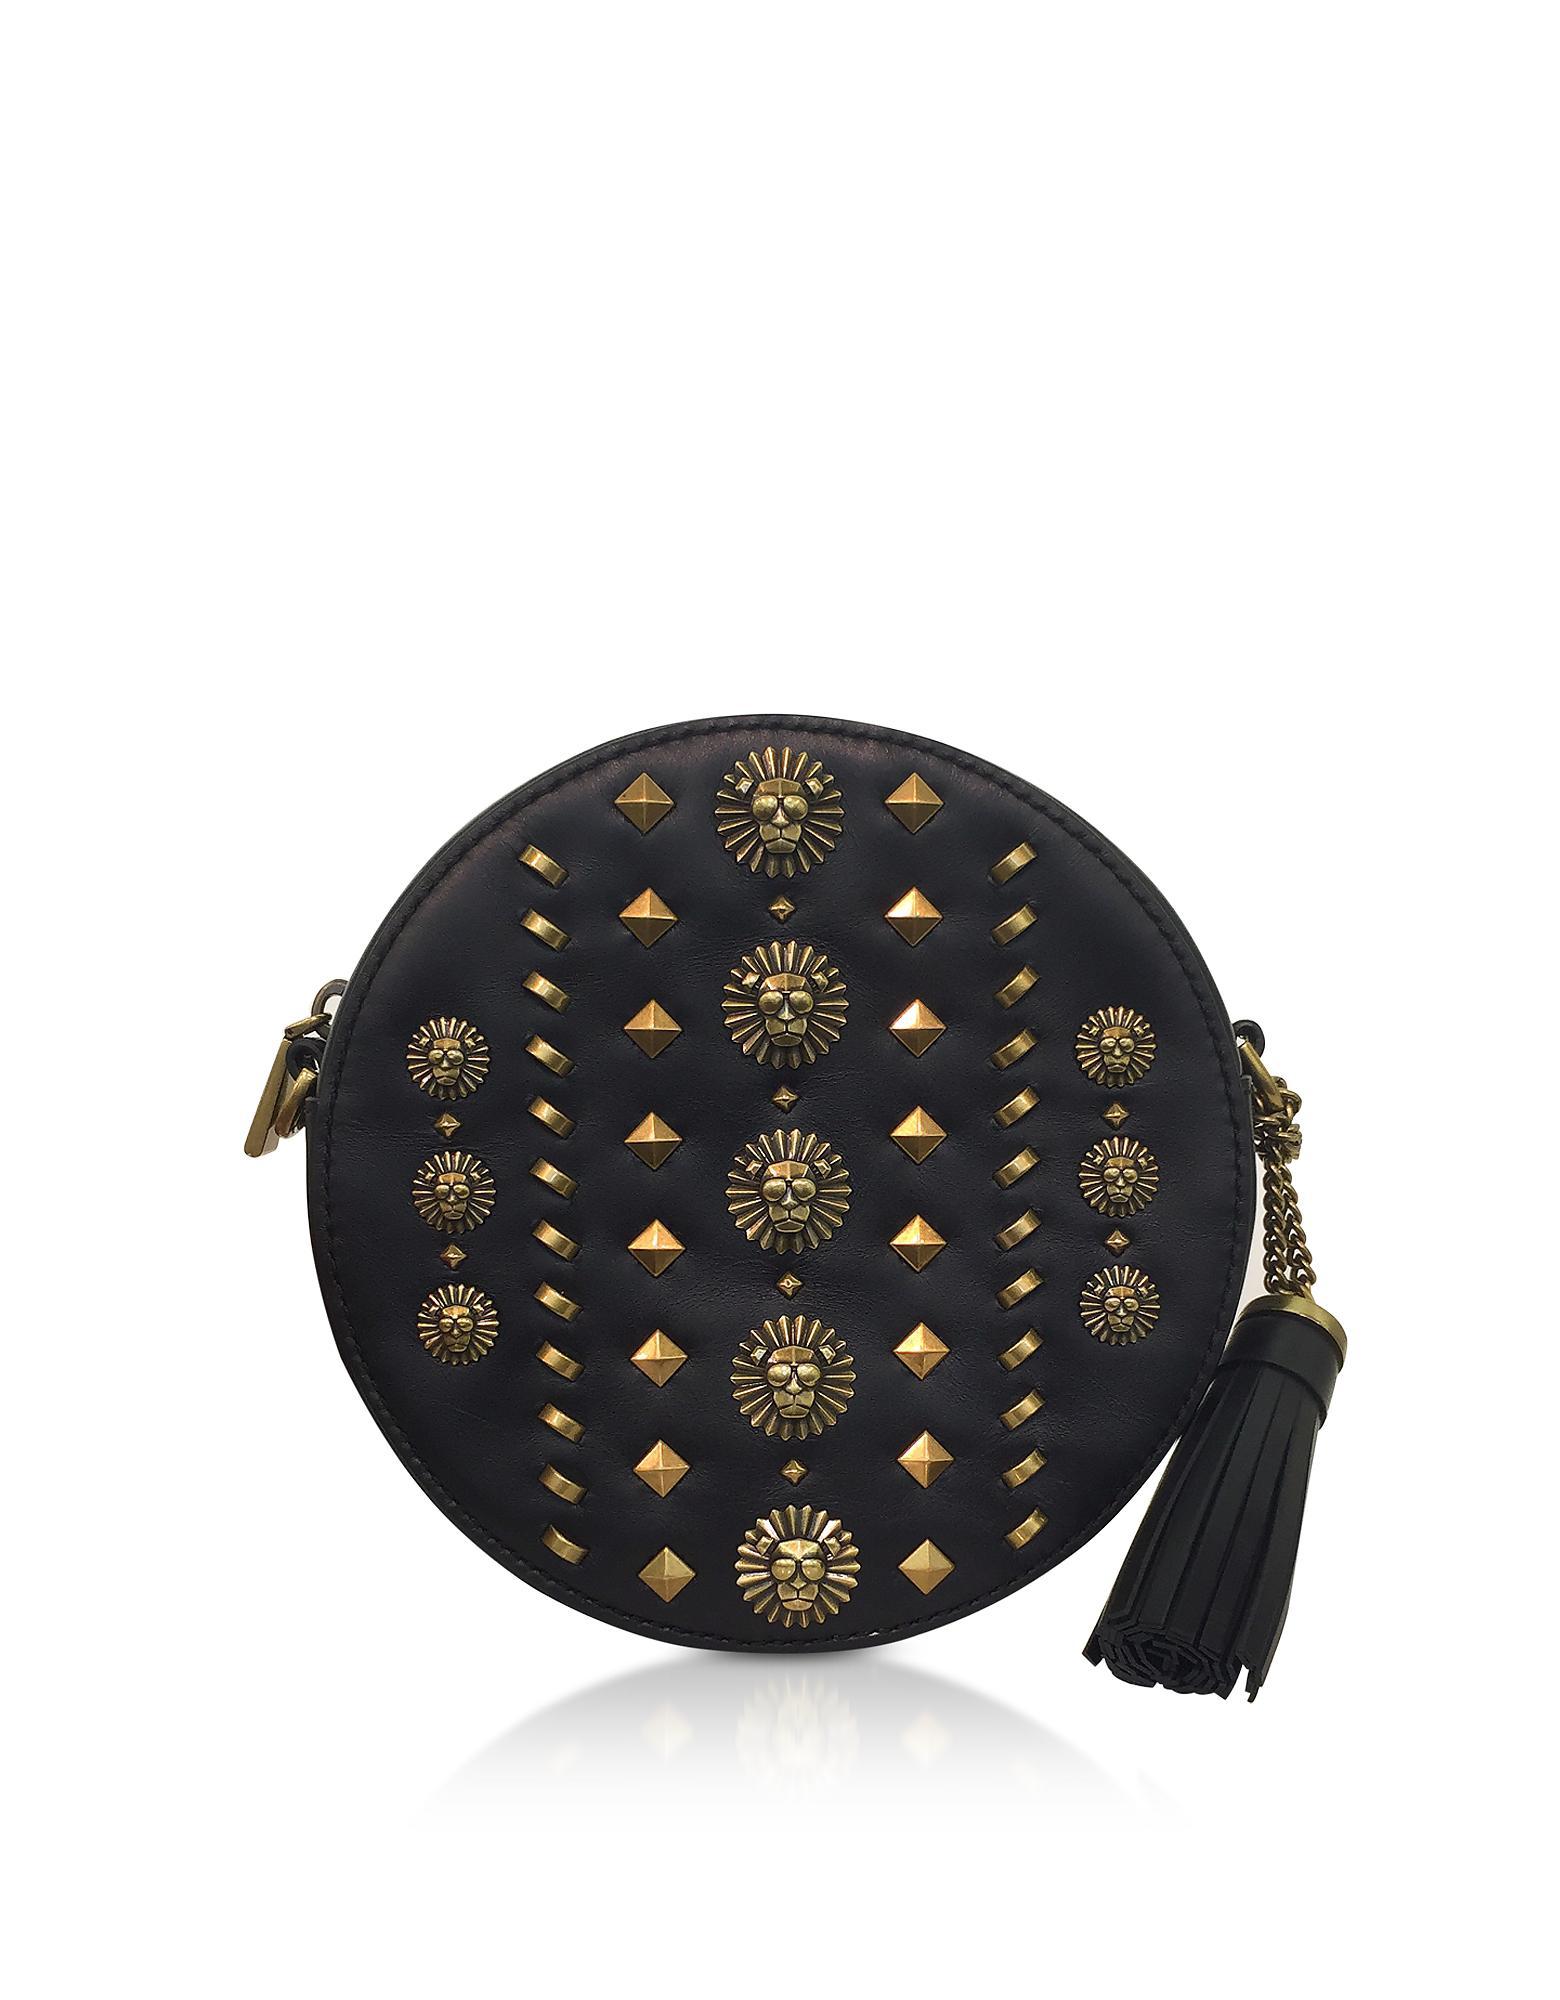 Lyst - Michael Kors Black Studded Polished Leather Canteen Crossbody ... b9175277104f6